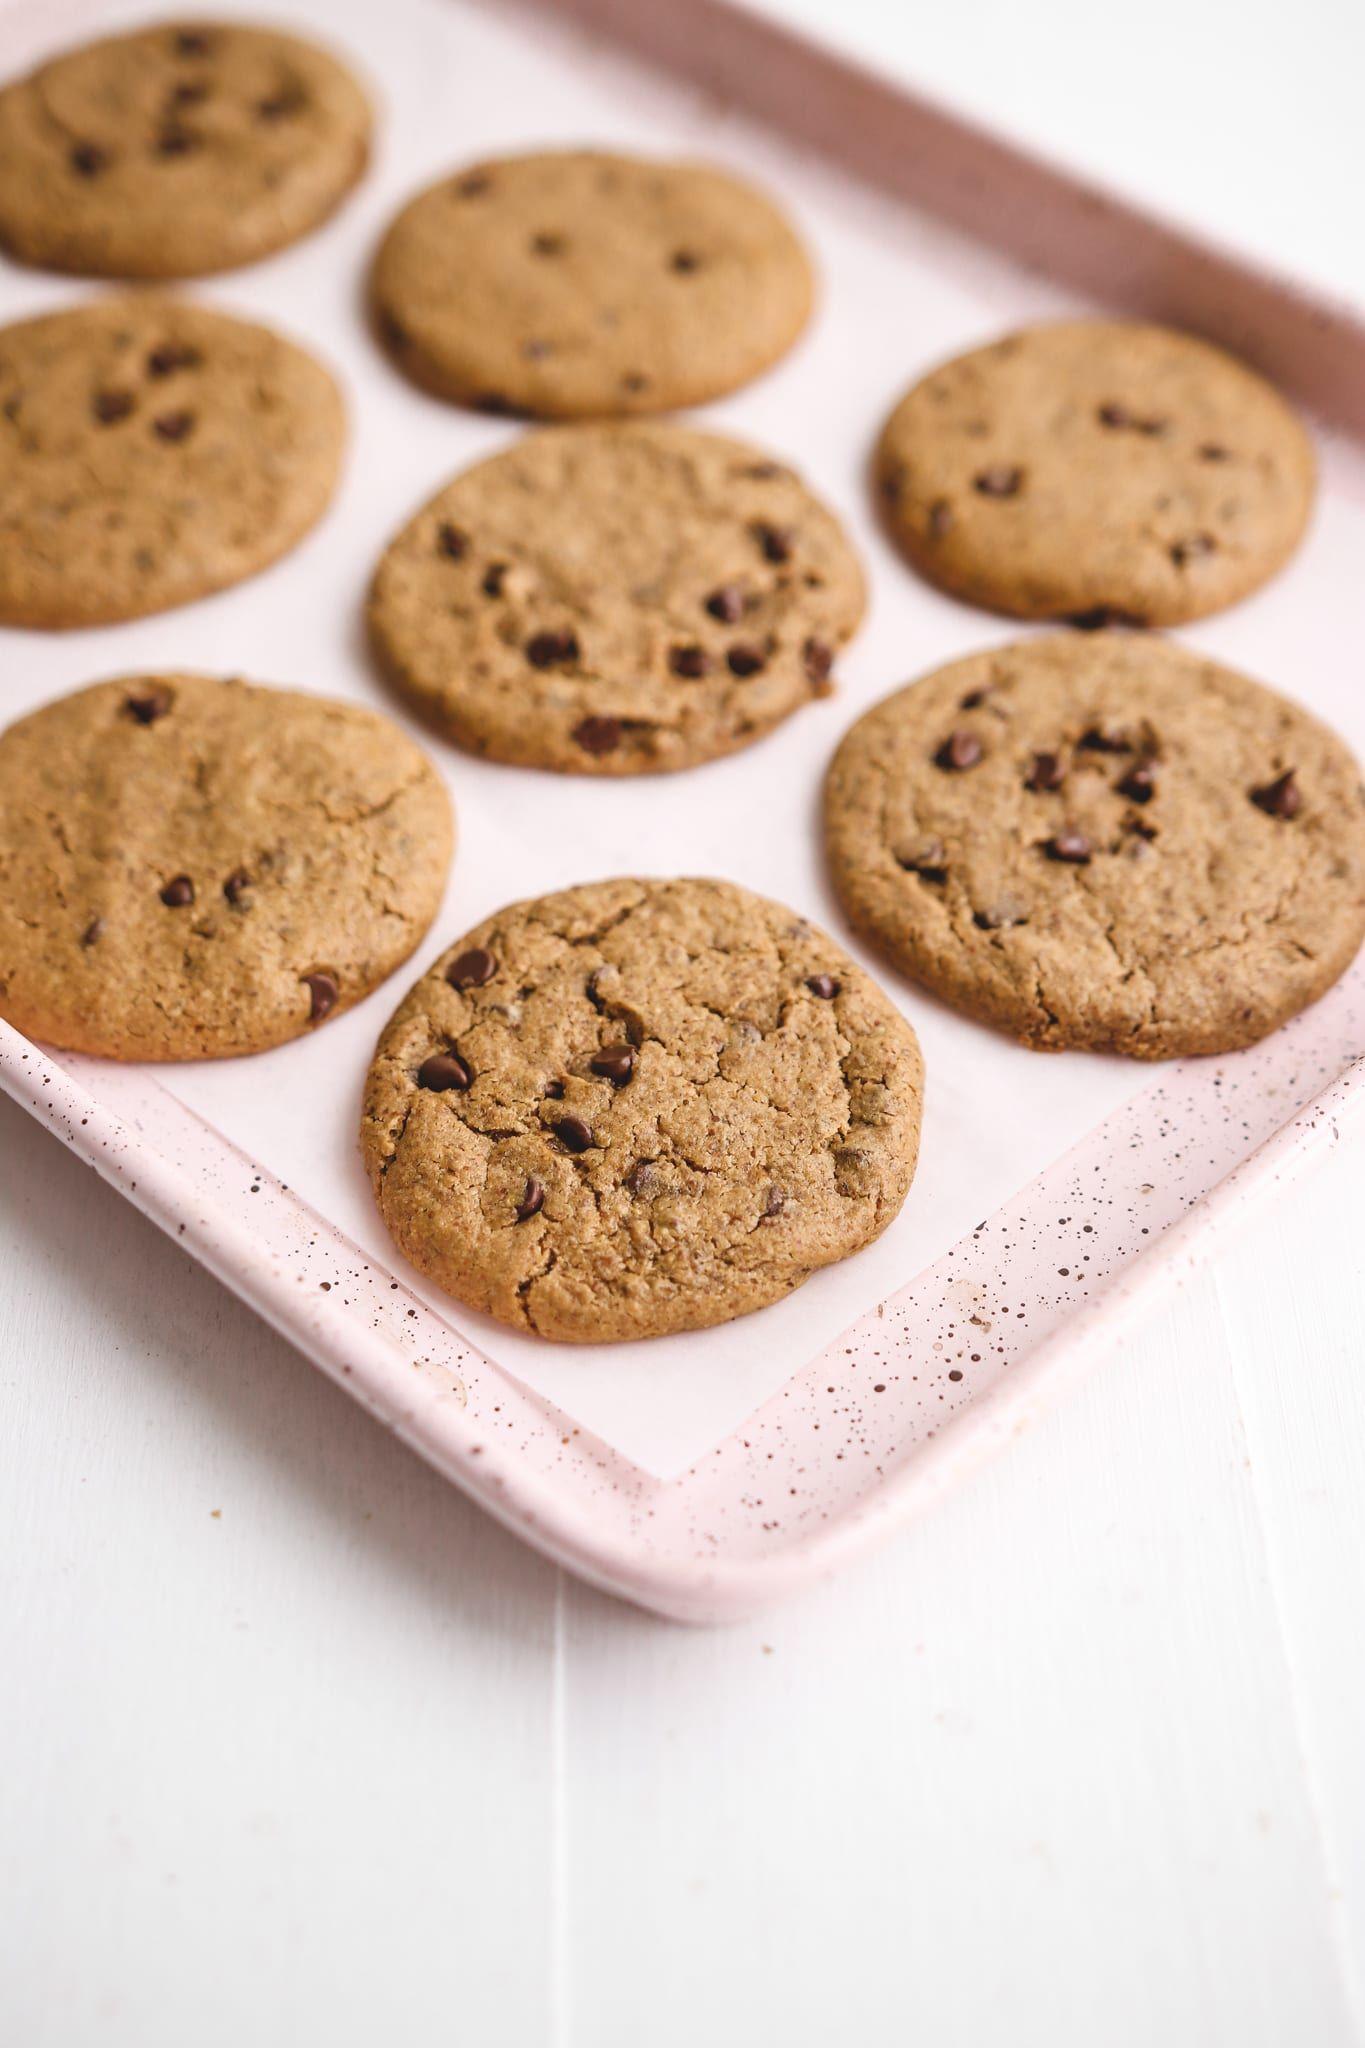 Best Healthy Chocolate Chip Cookies Vegan Gluten Free Refined Sugar Free Oil Free Veggiekins Blog Recipe In 2020 Healthy Chocolate Healthy Chocolate Chip Healthy Chocolate Chip Cookies